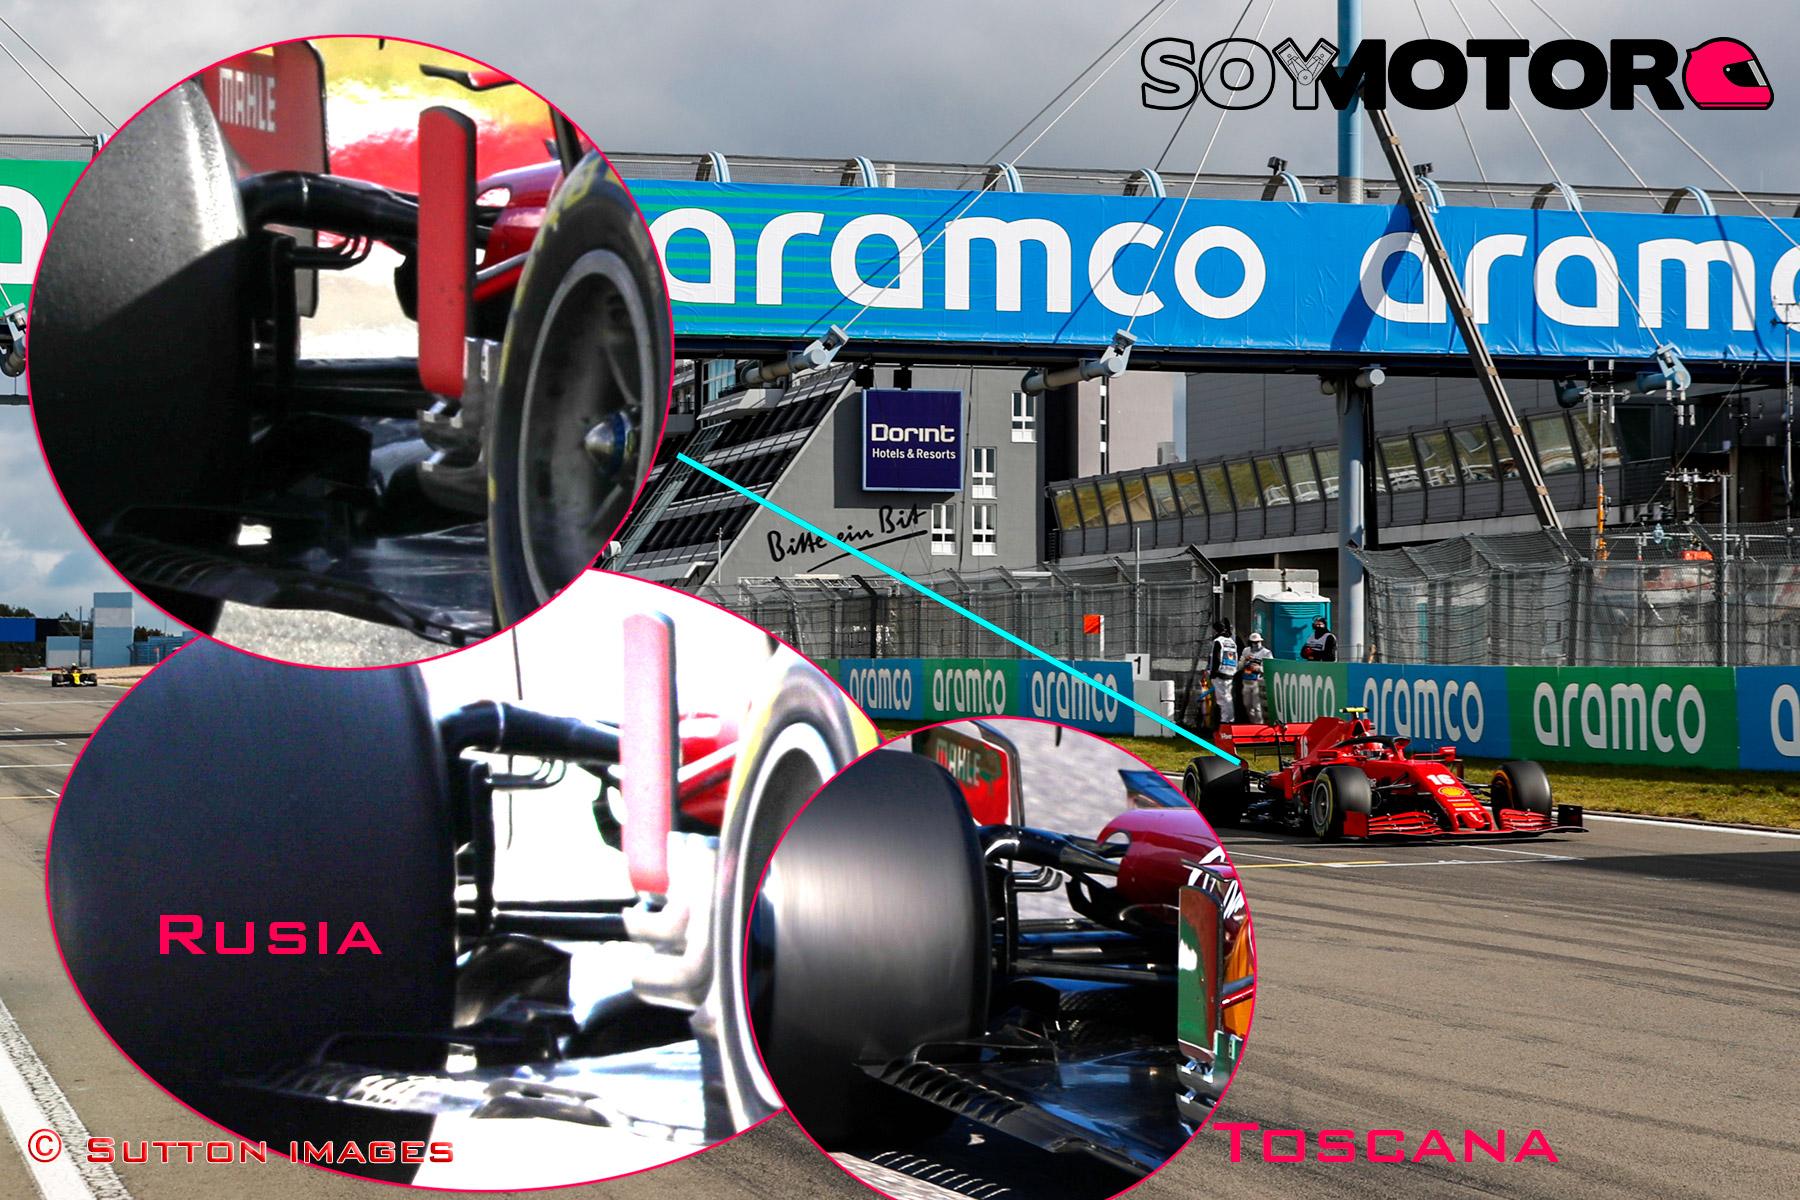 ferrari-suspension-trasera-soymotor.jpg